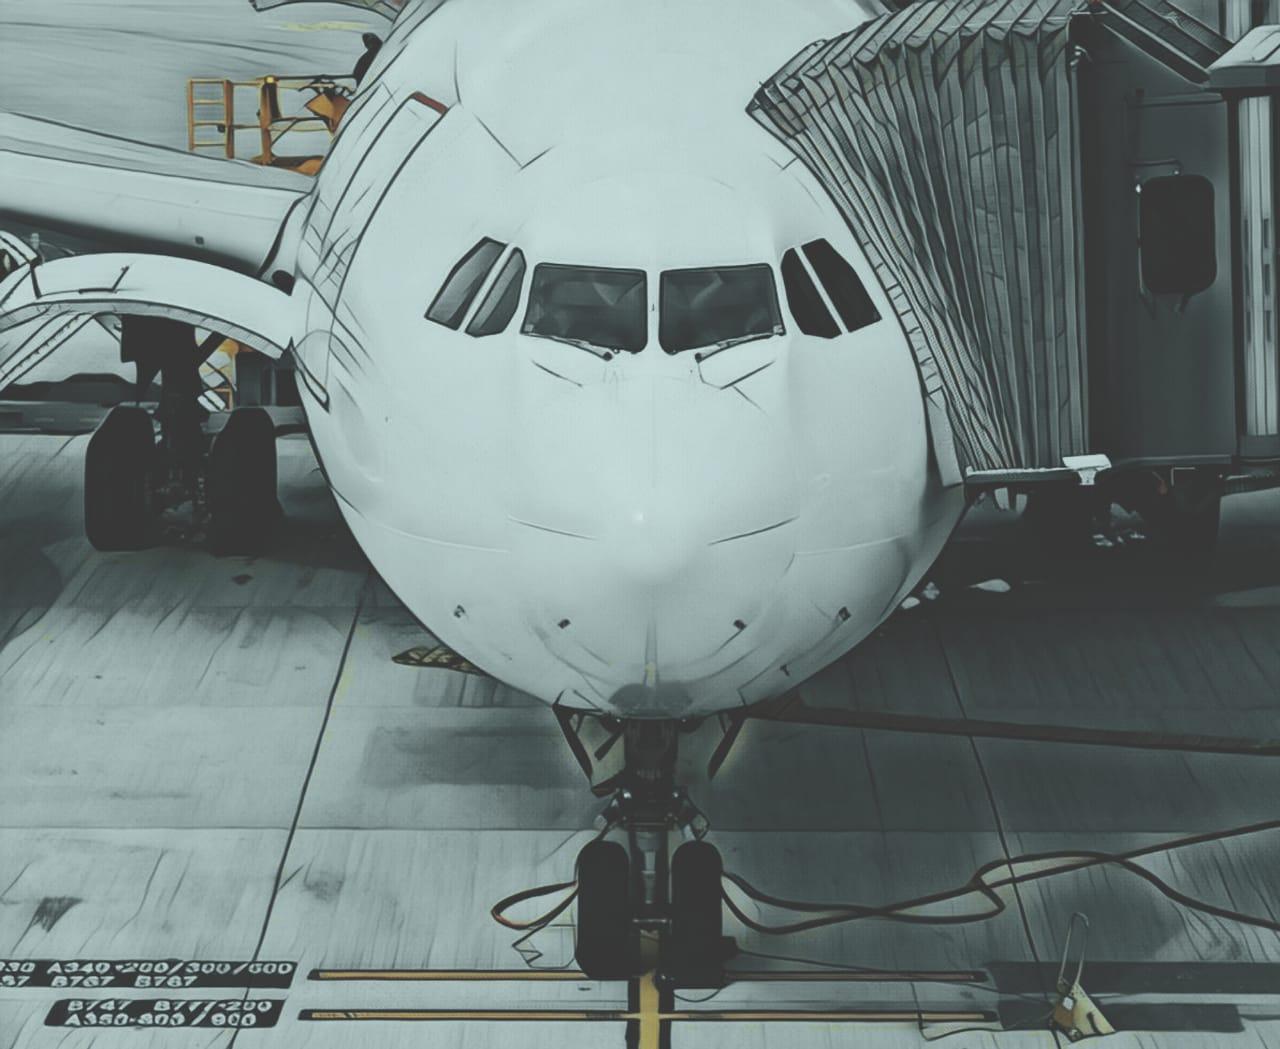 https: img-z.okeinfo.net content 2020 01 05 320 2149465 fakta-sepinya-penumpang-pesawat-harga-tiket-kemahalan-kLrBJcvjqr.jpeg